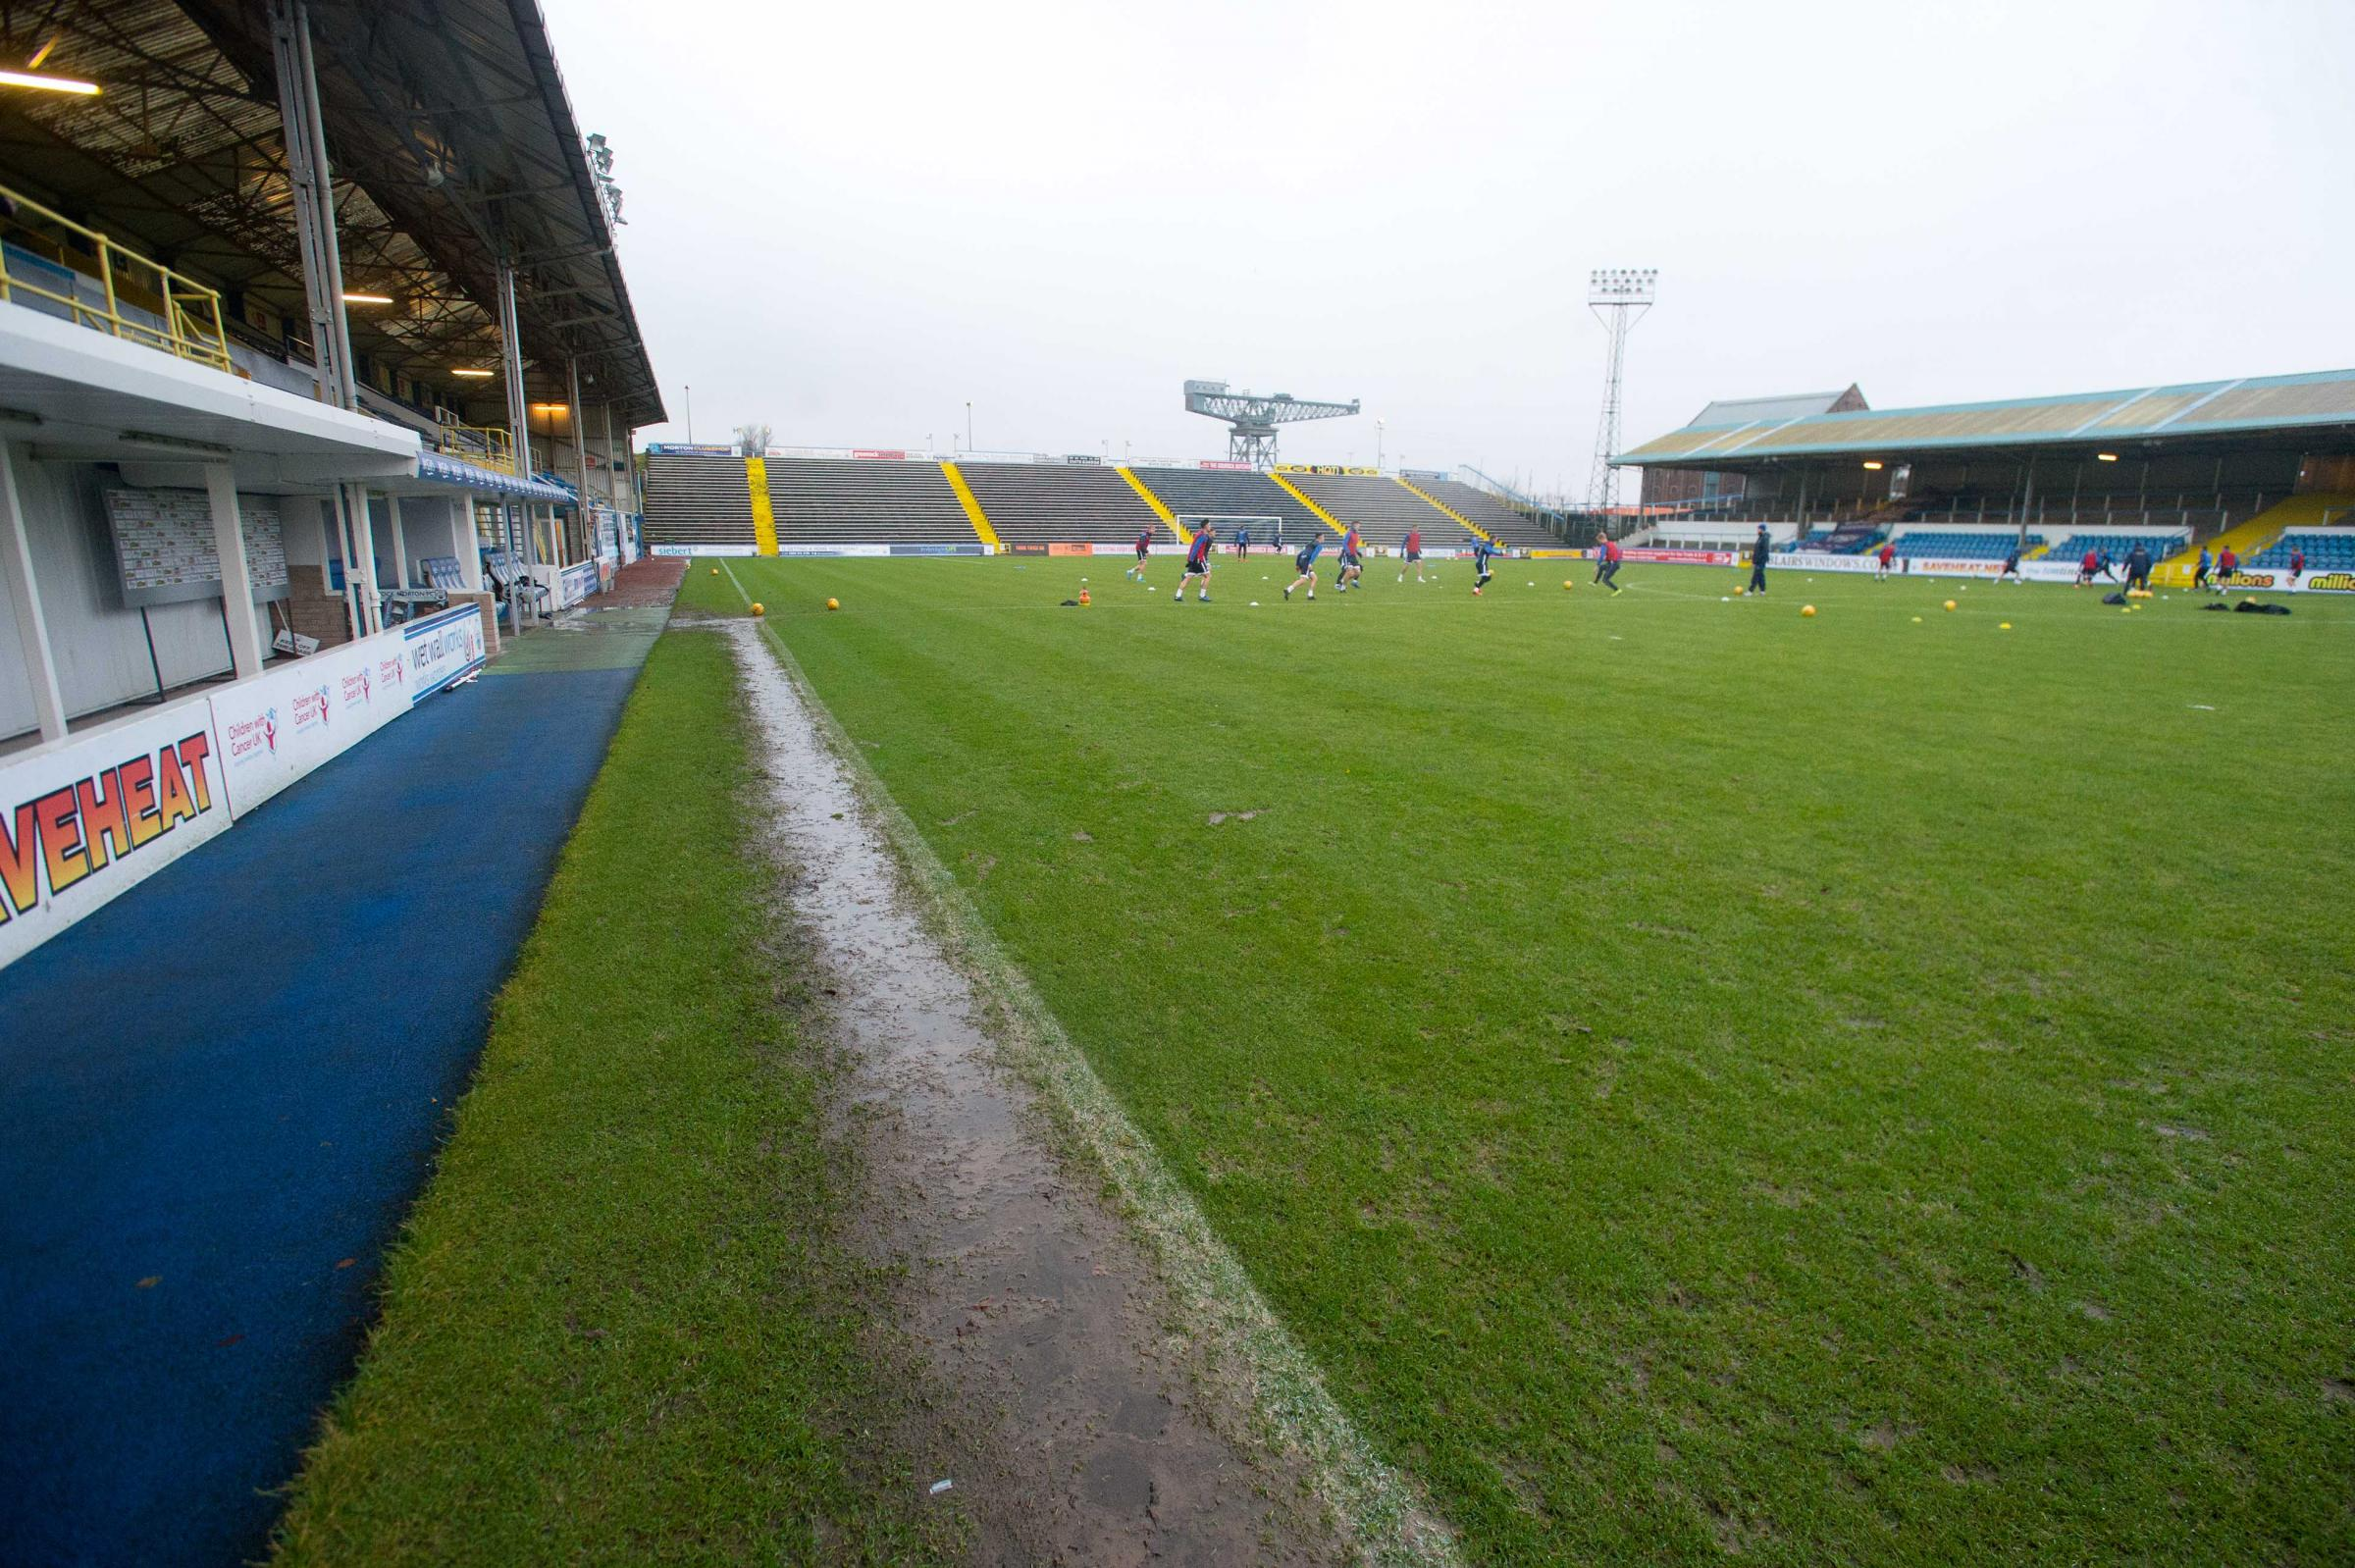 Morton 'hopeful' East Kilbride tie will go ahead despite Covid-19 uncertainty